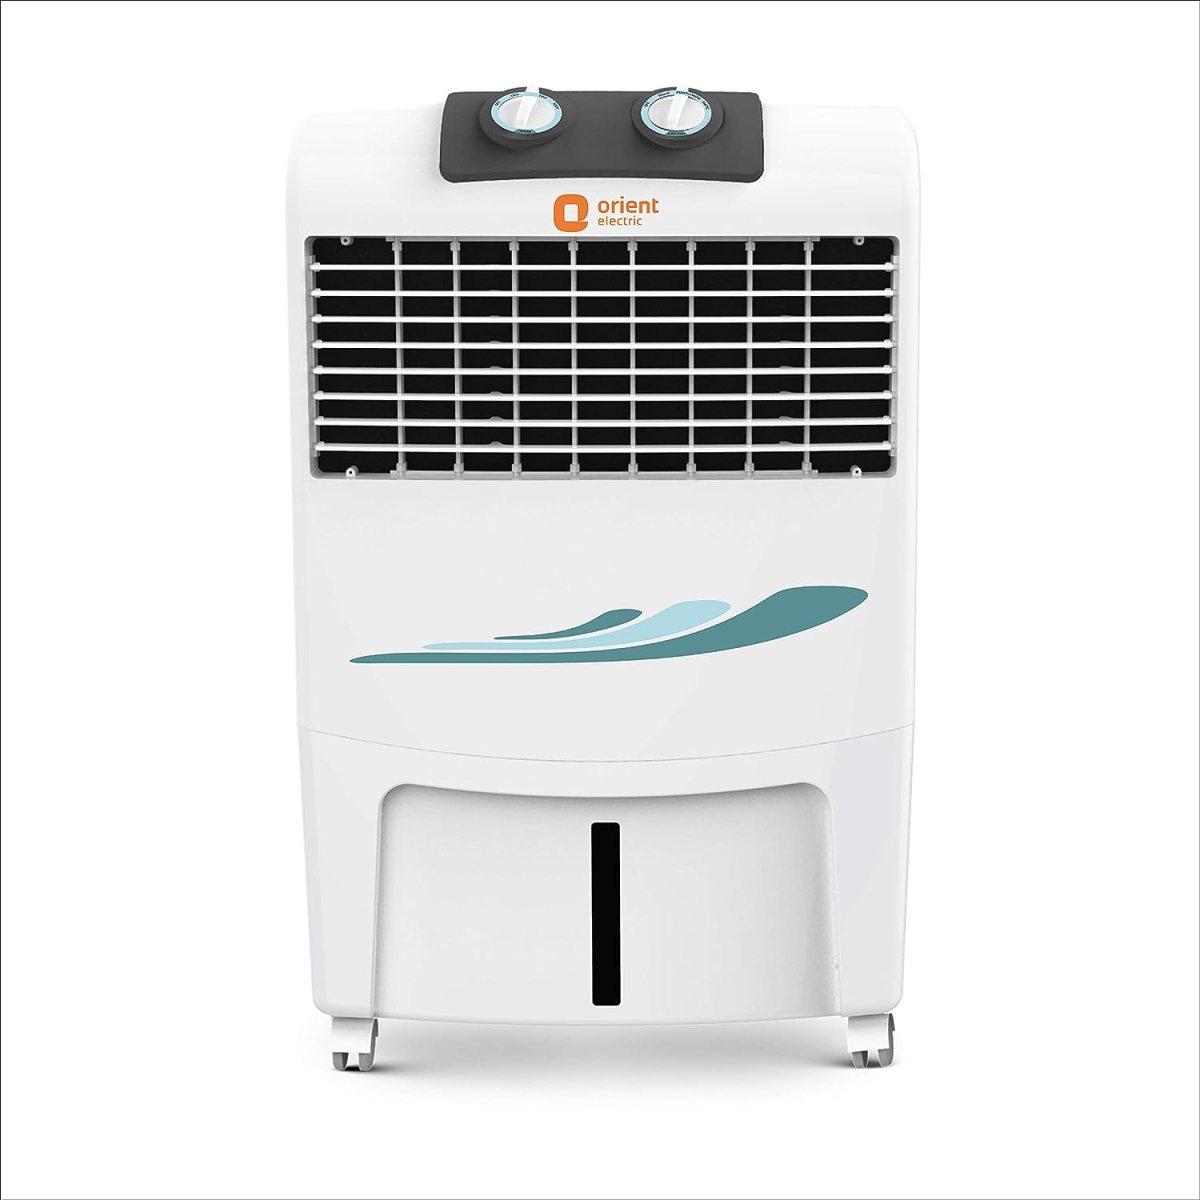 Orient Electric Smartcool-DX CP1601H 16-Litre Personal Air Cooler 2020